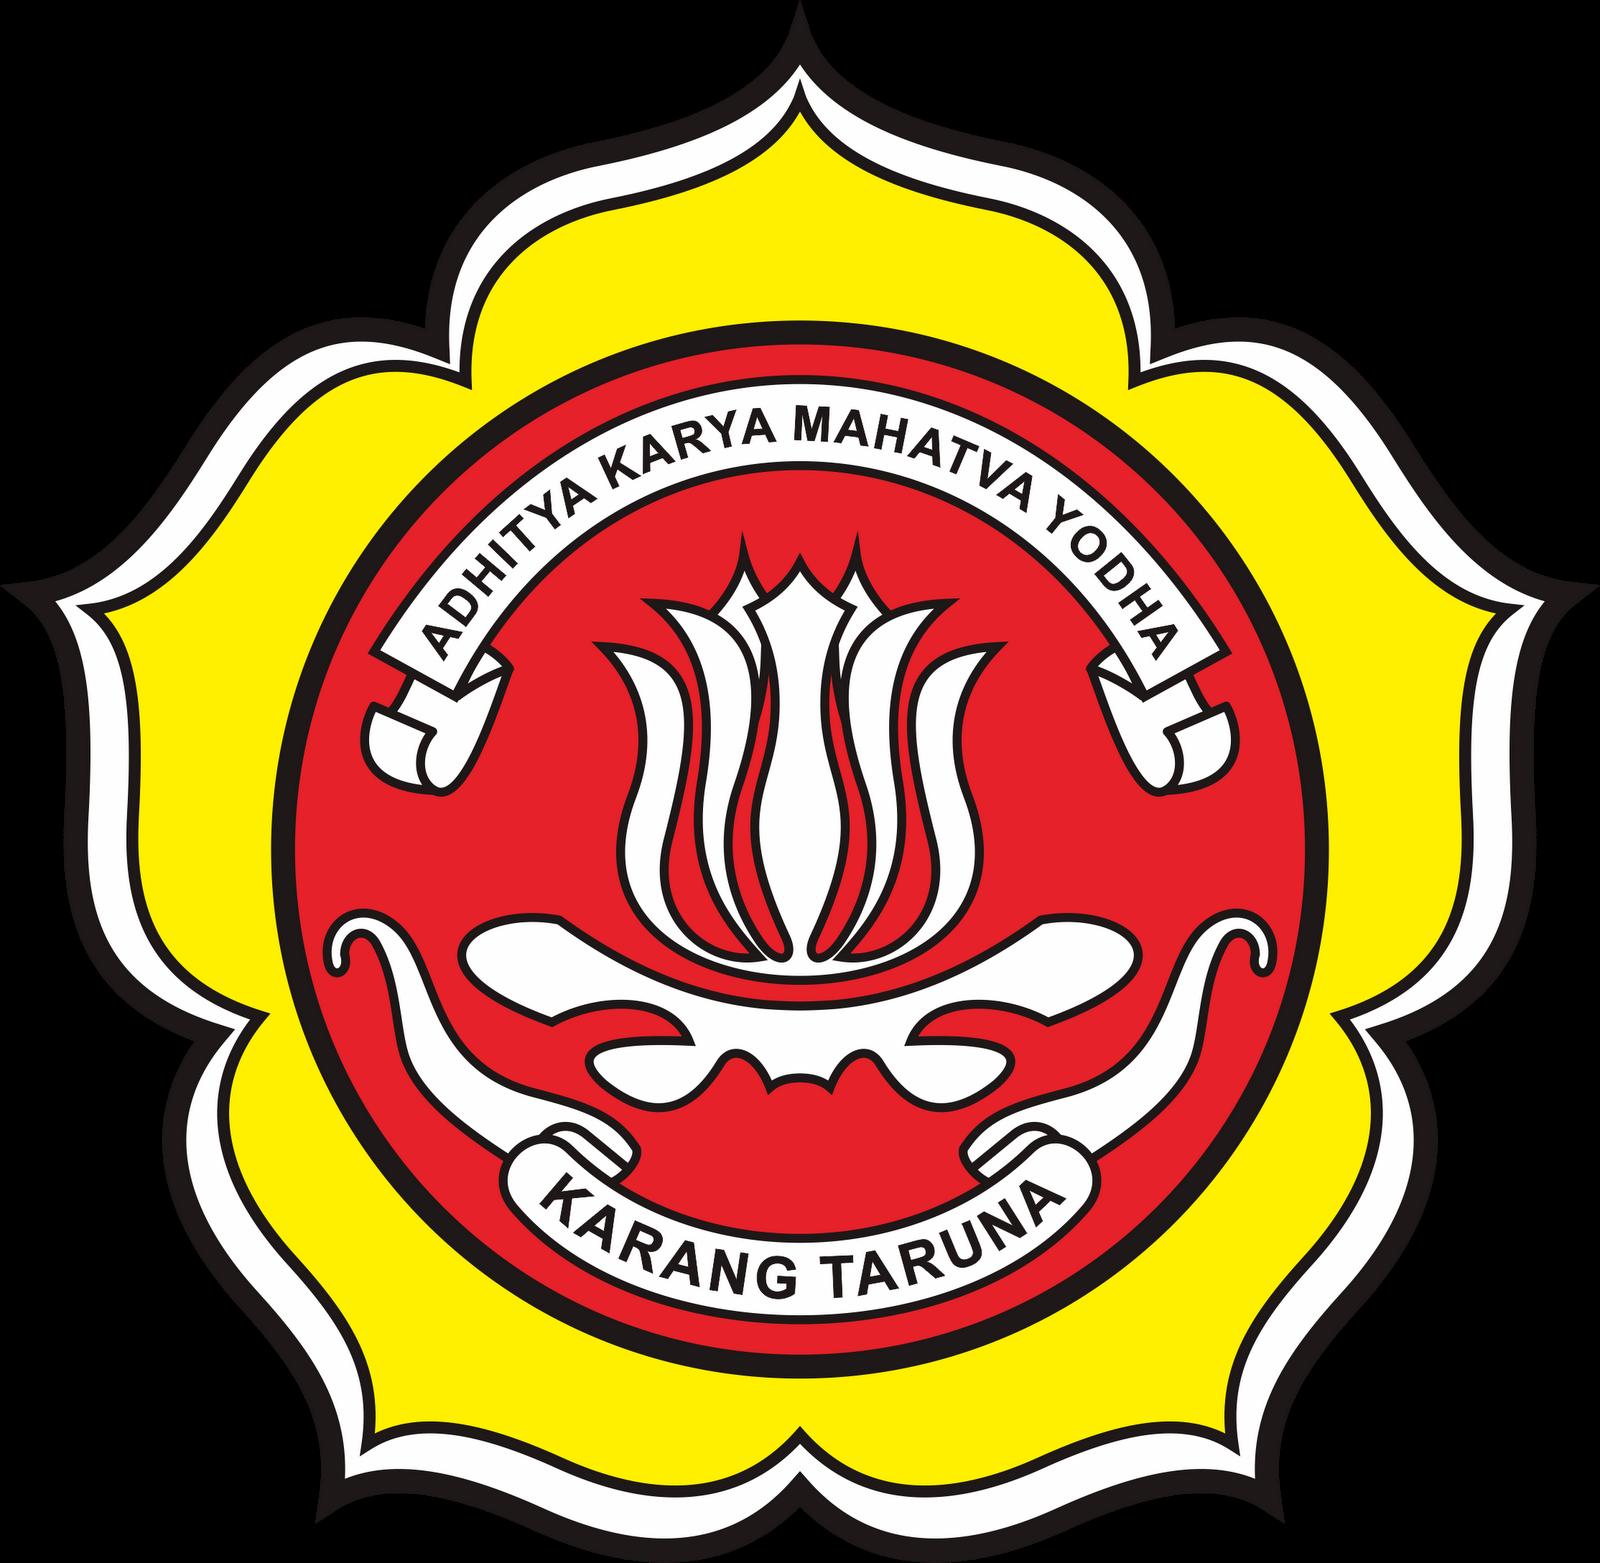 Logo karang taruna clipart images gallery for free download.